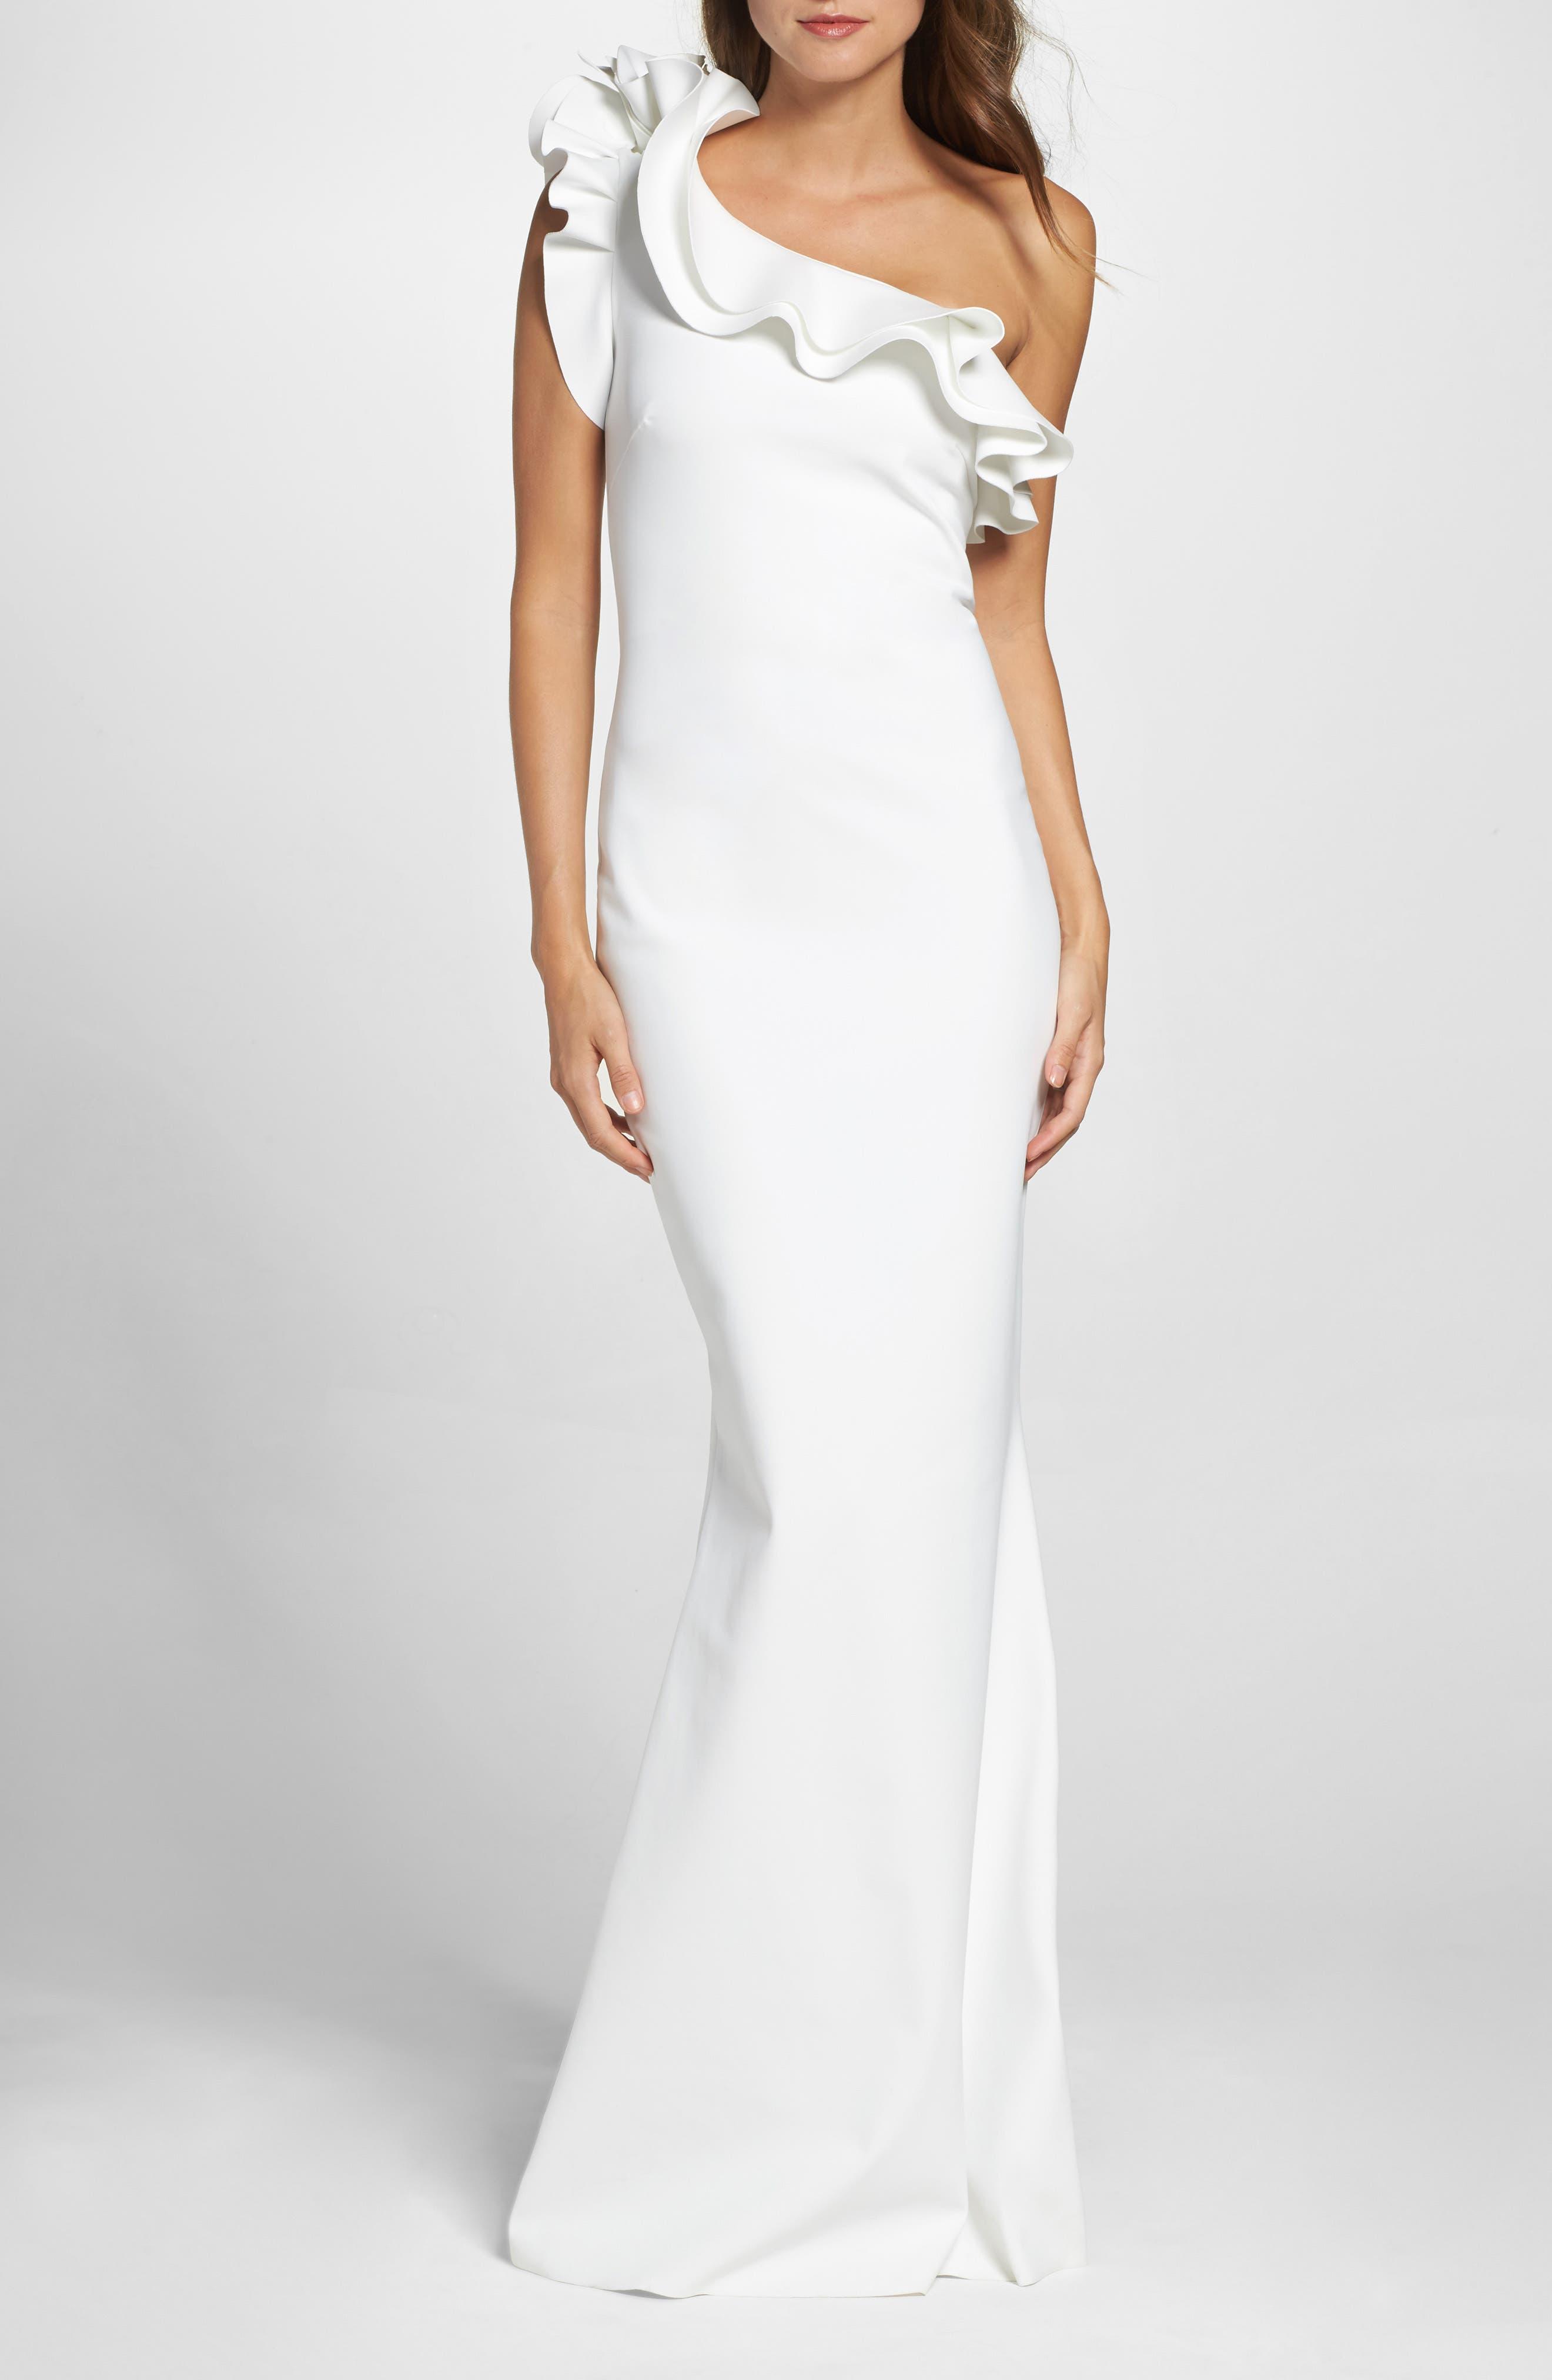 Chiara Boni la Petite Robe Elisir Ruffle One-Shoulder Gown